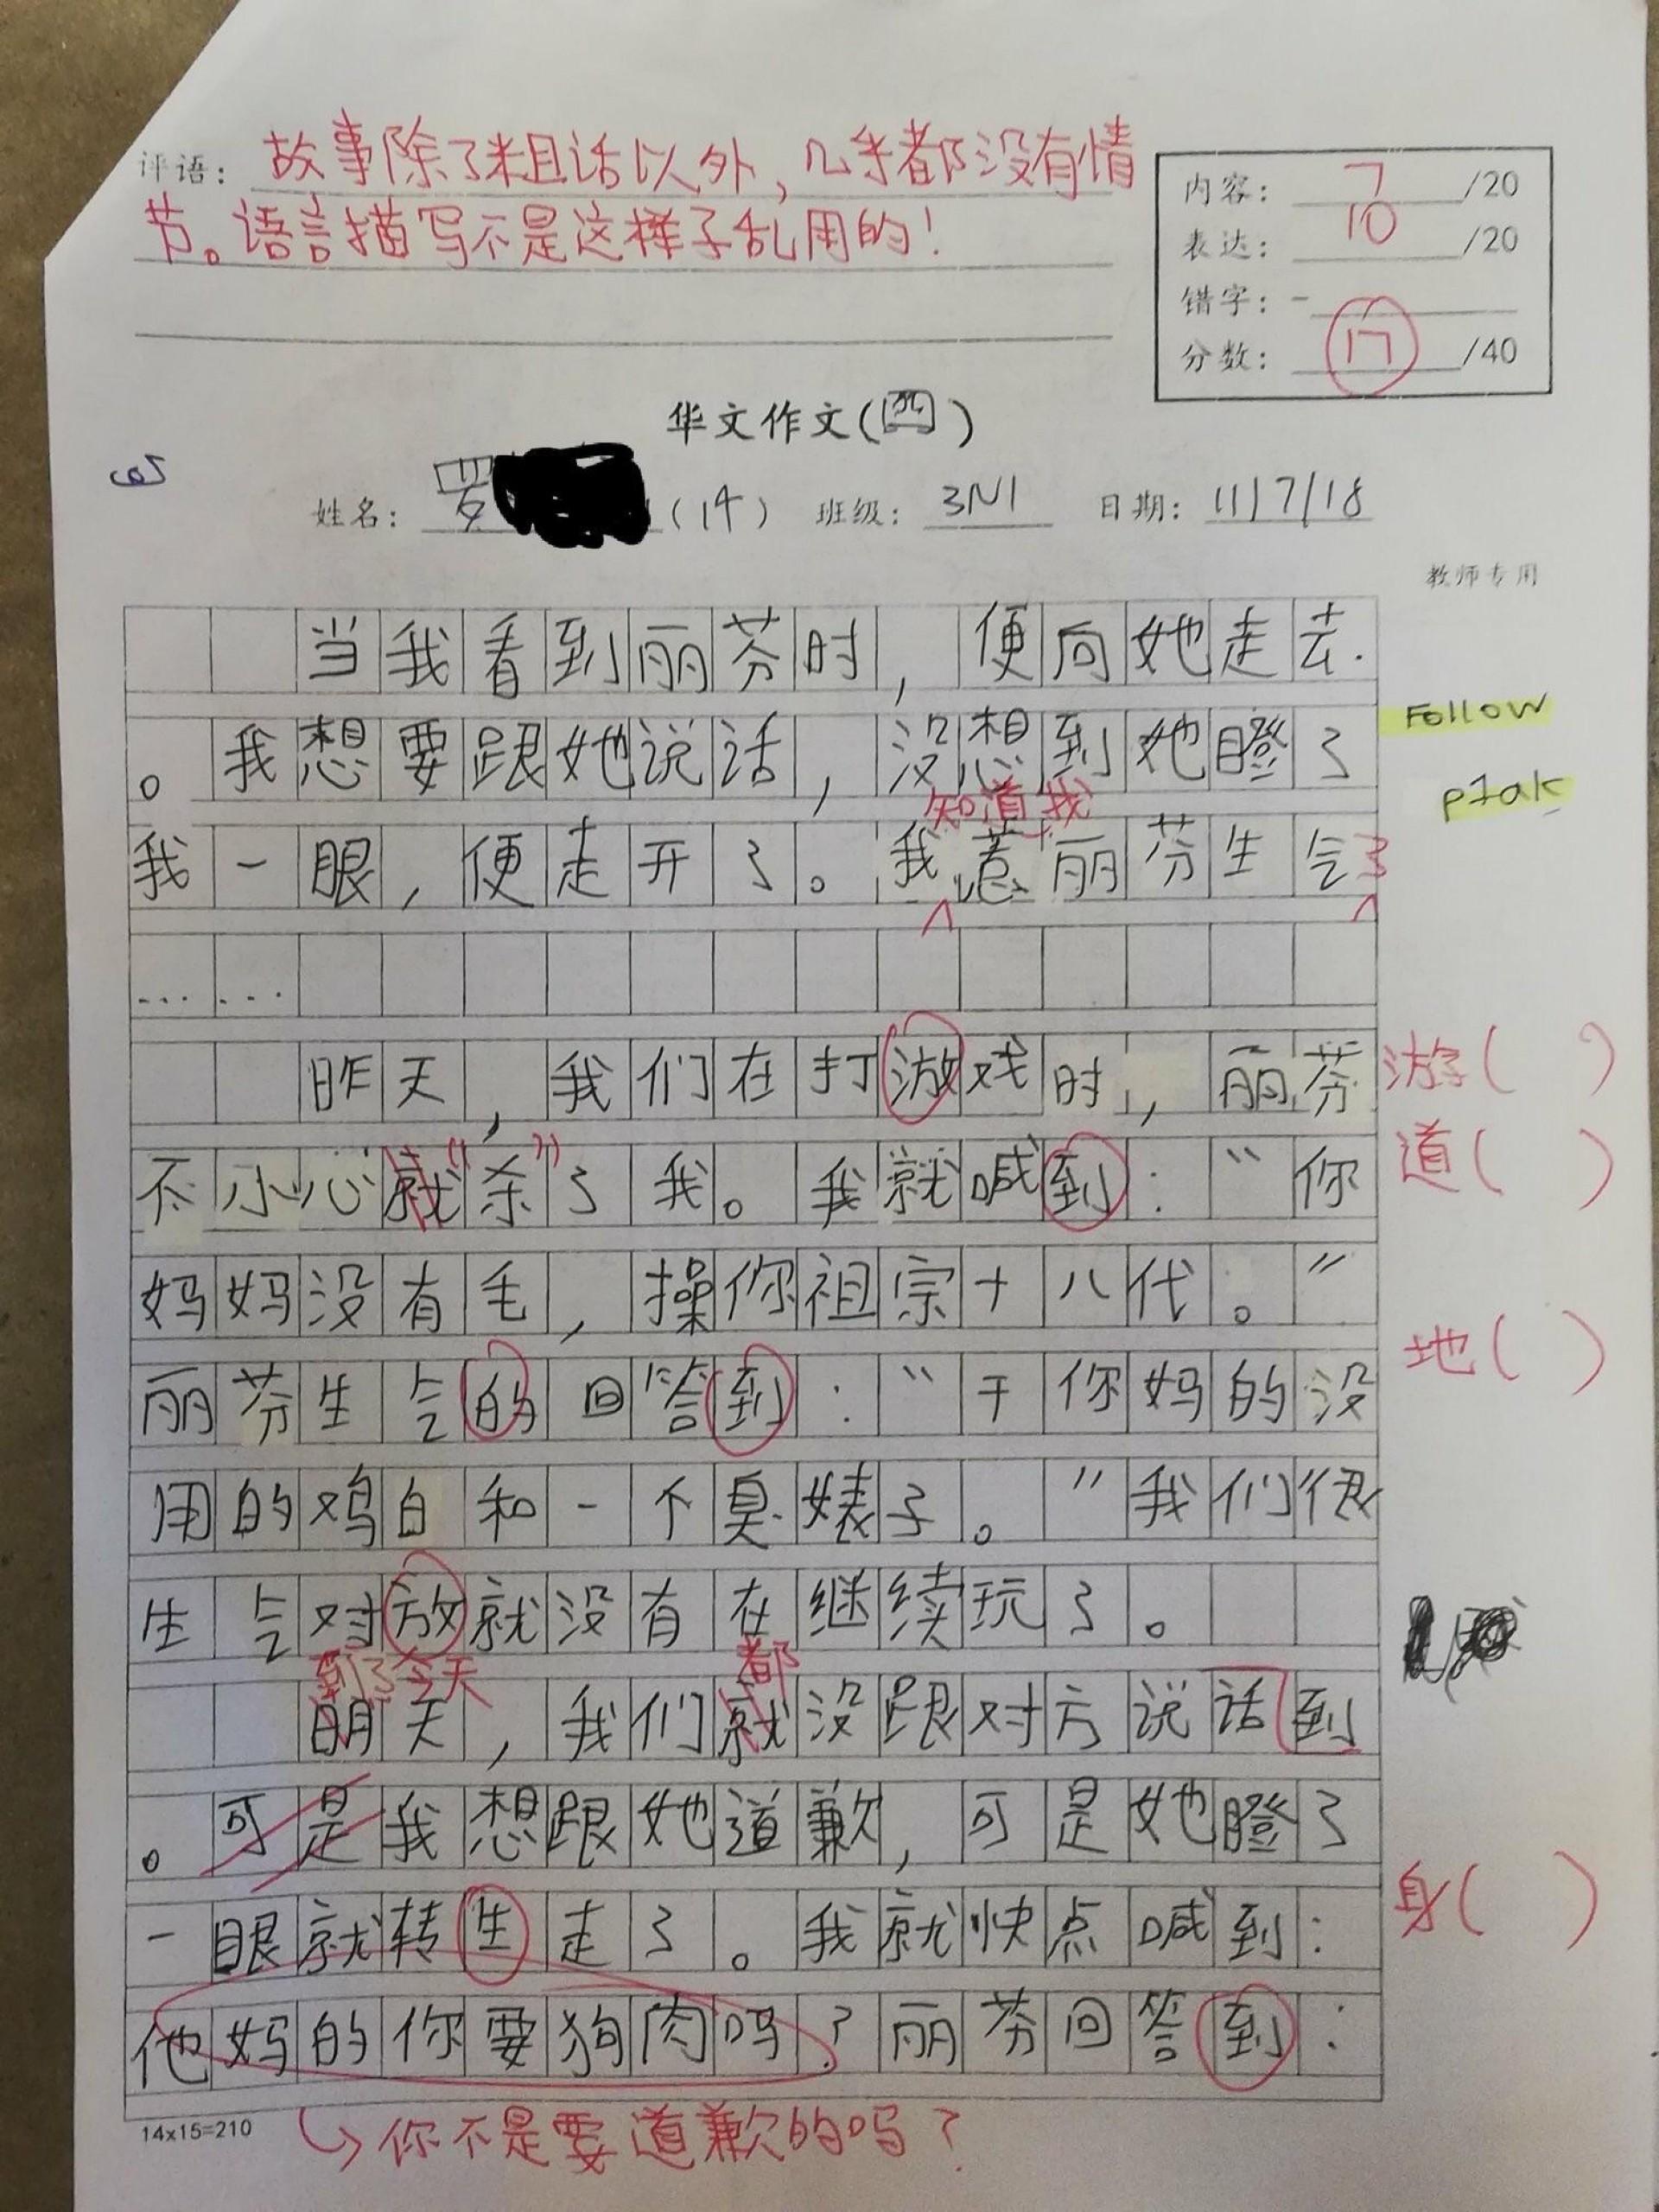 017 Essay Example Wbn5f0l88kj11 Amazing Chinese Art Topics Vce Formats Sheet 1920